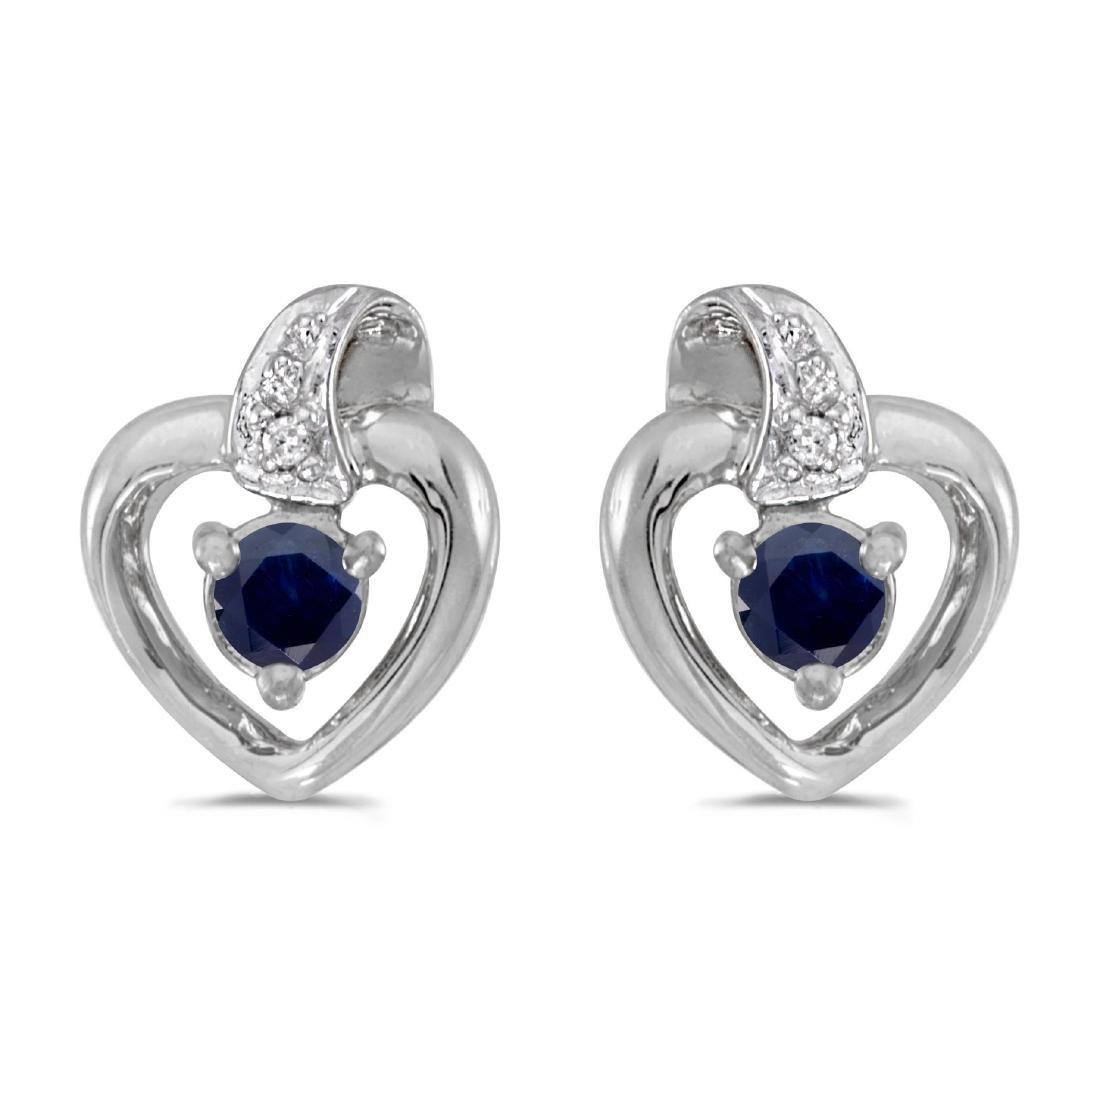 Certified 10k White Gold Round Sapphire And Diamond Hea